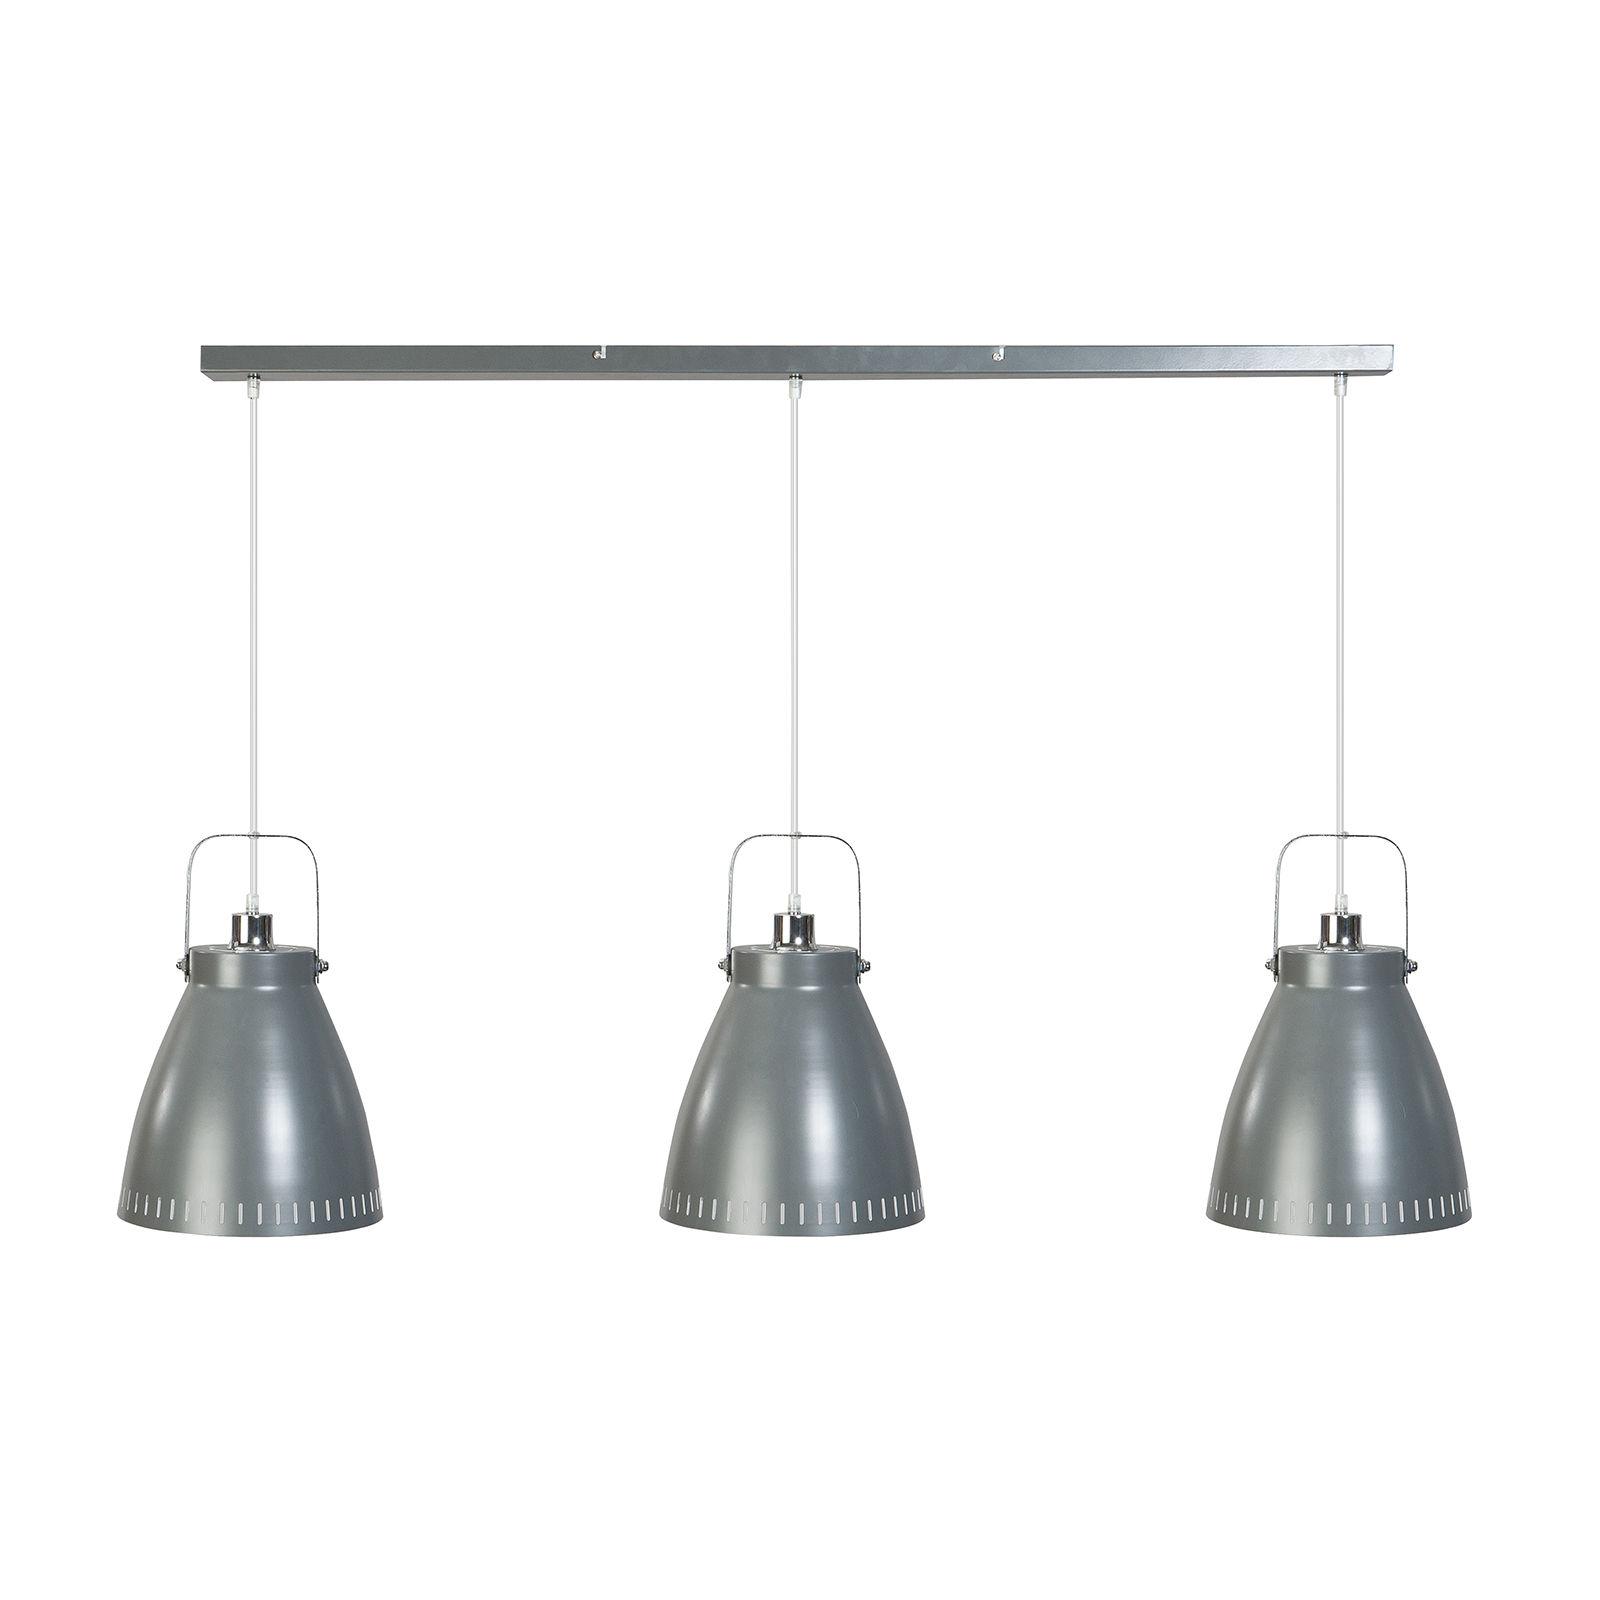 Acate hanglamp ETH chroom - grijs